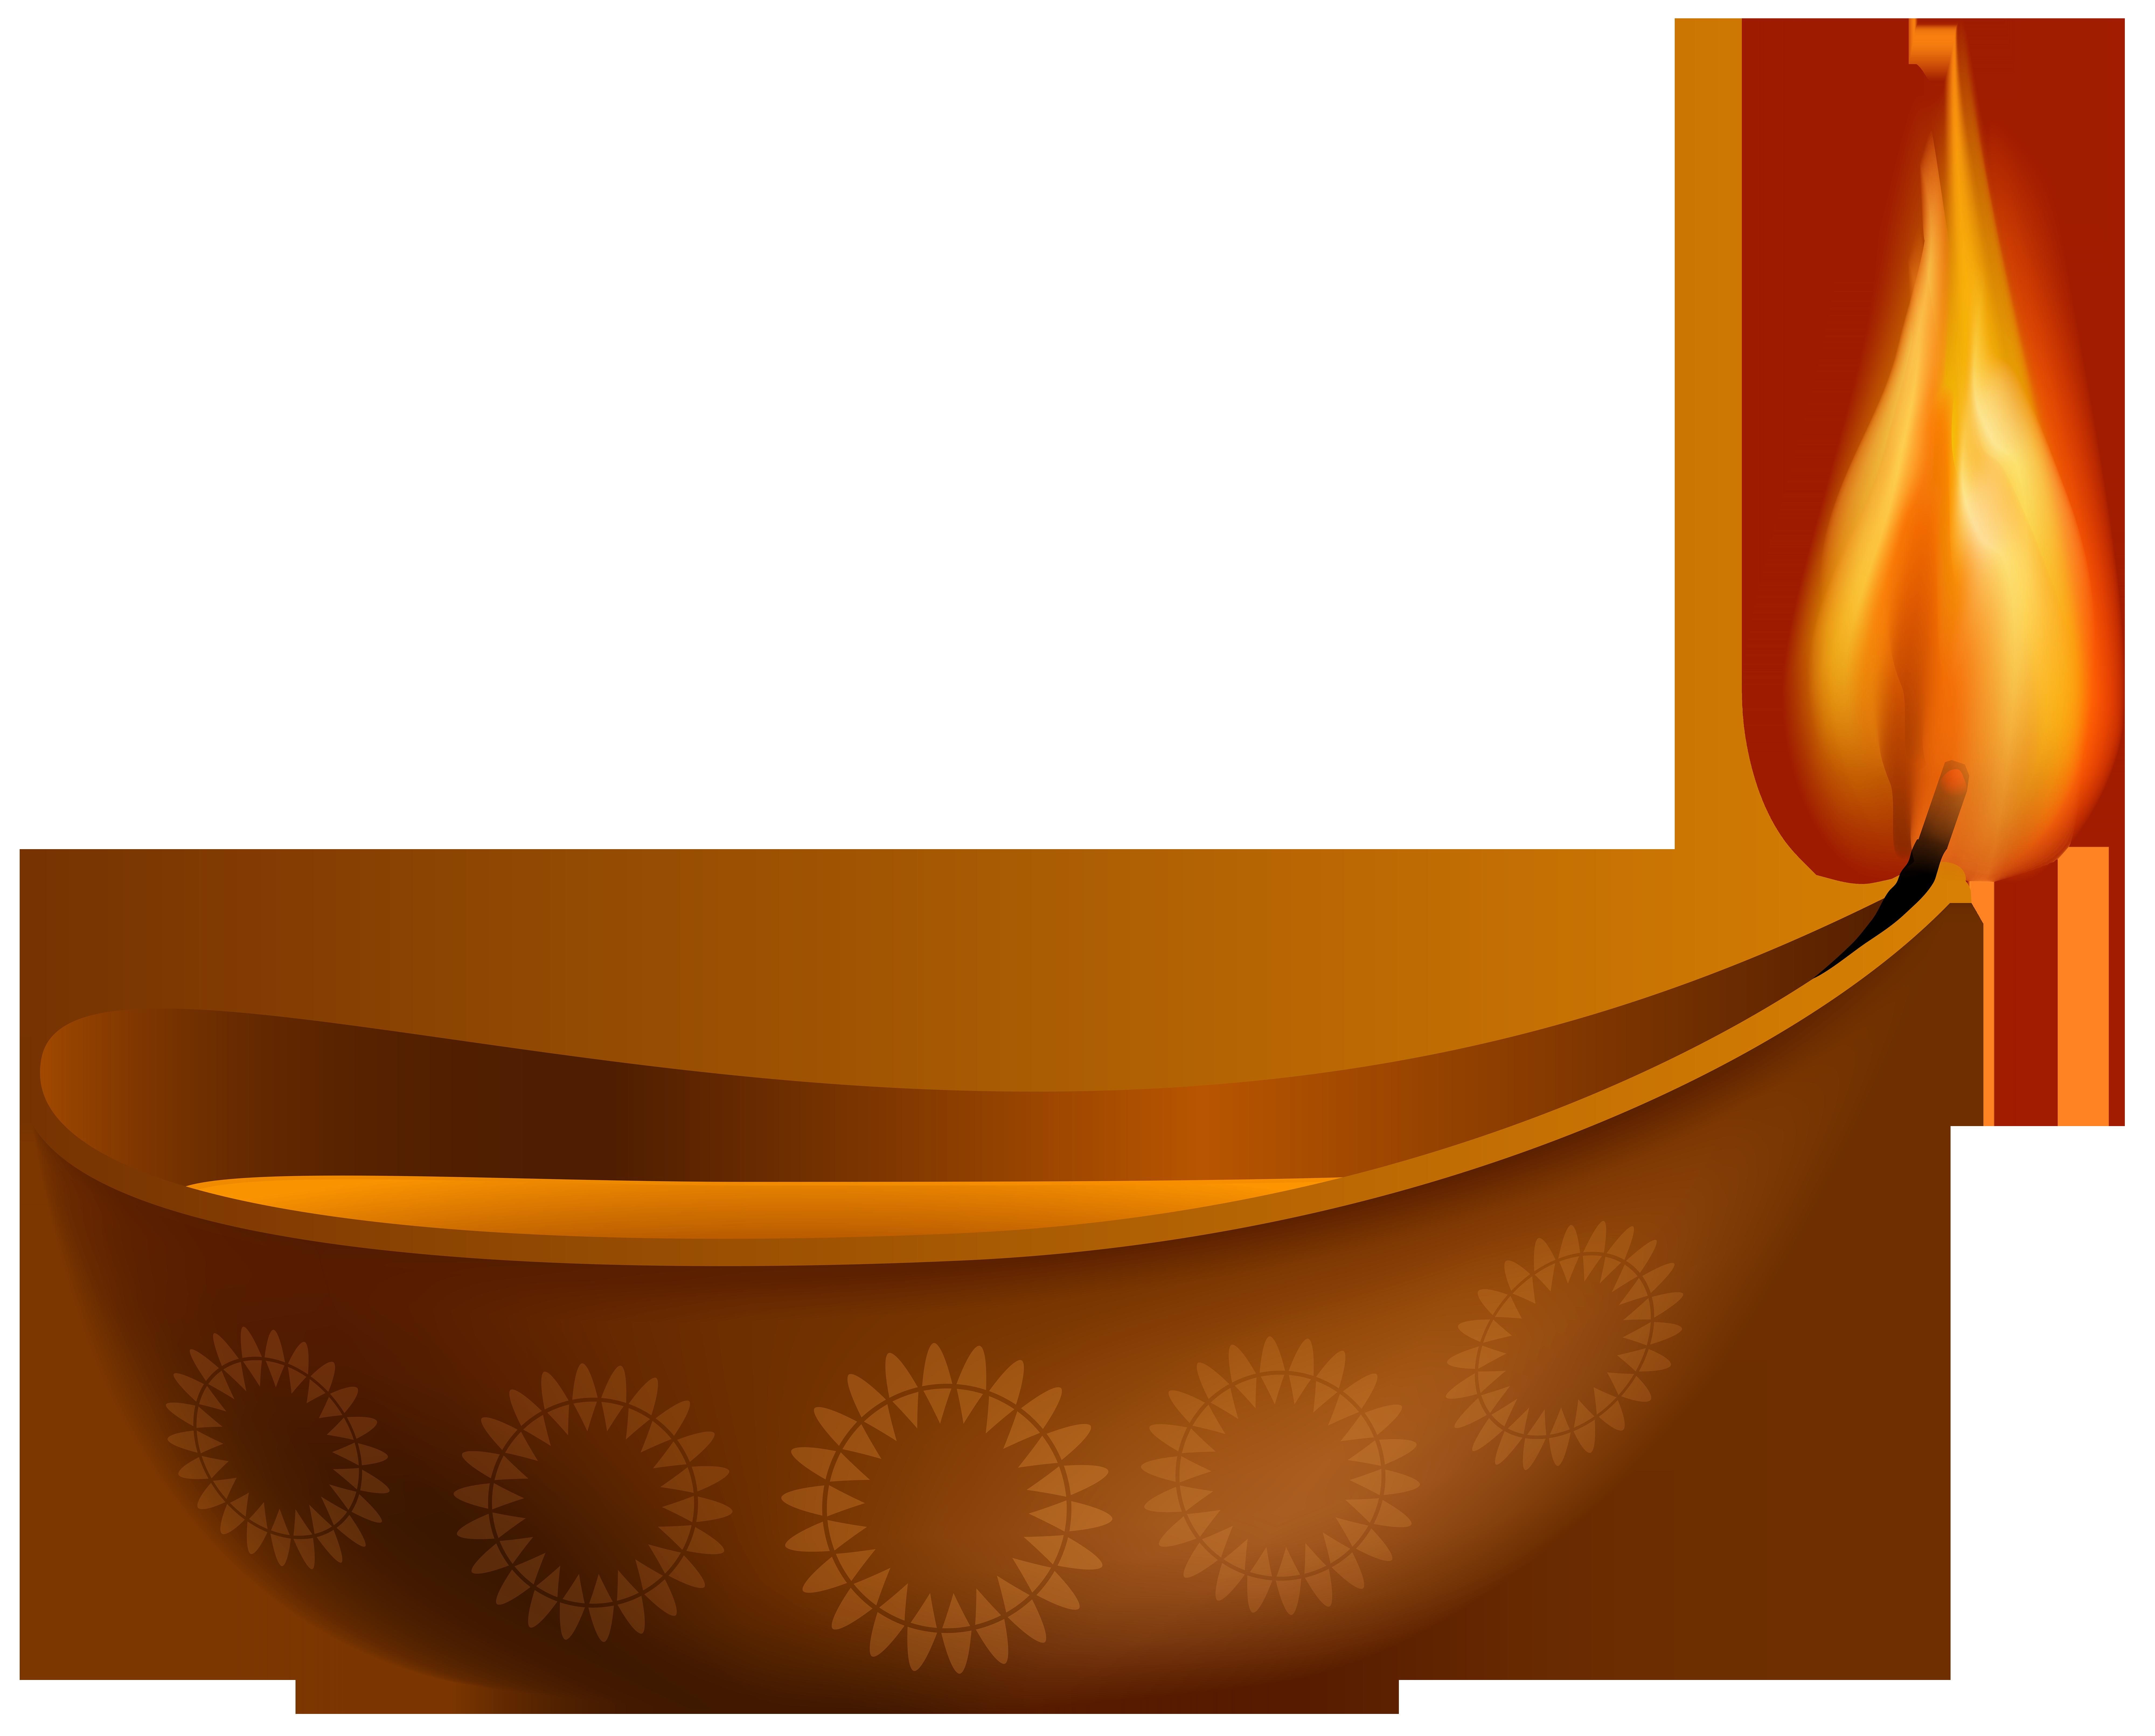 Happy candle png transparent. 2018 clipart diwali